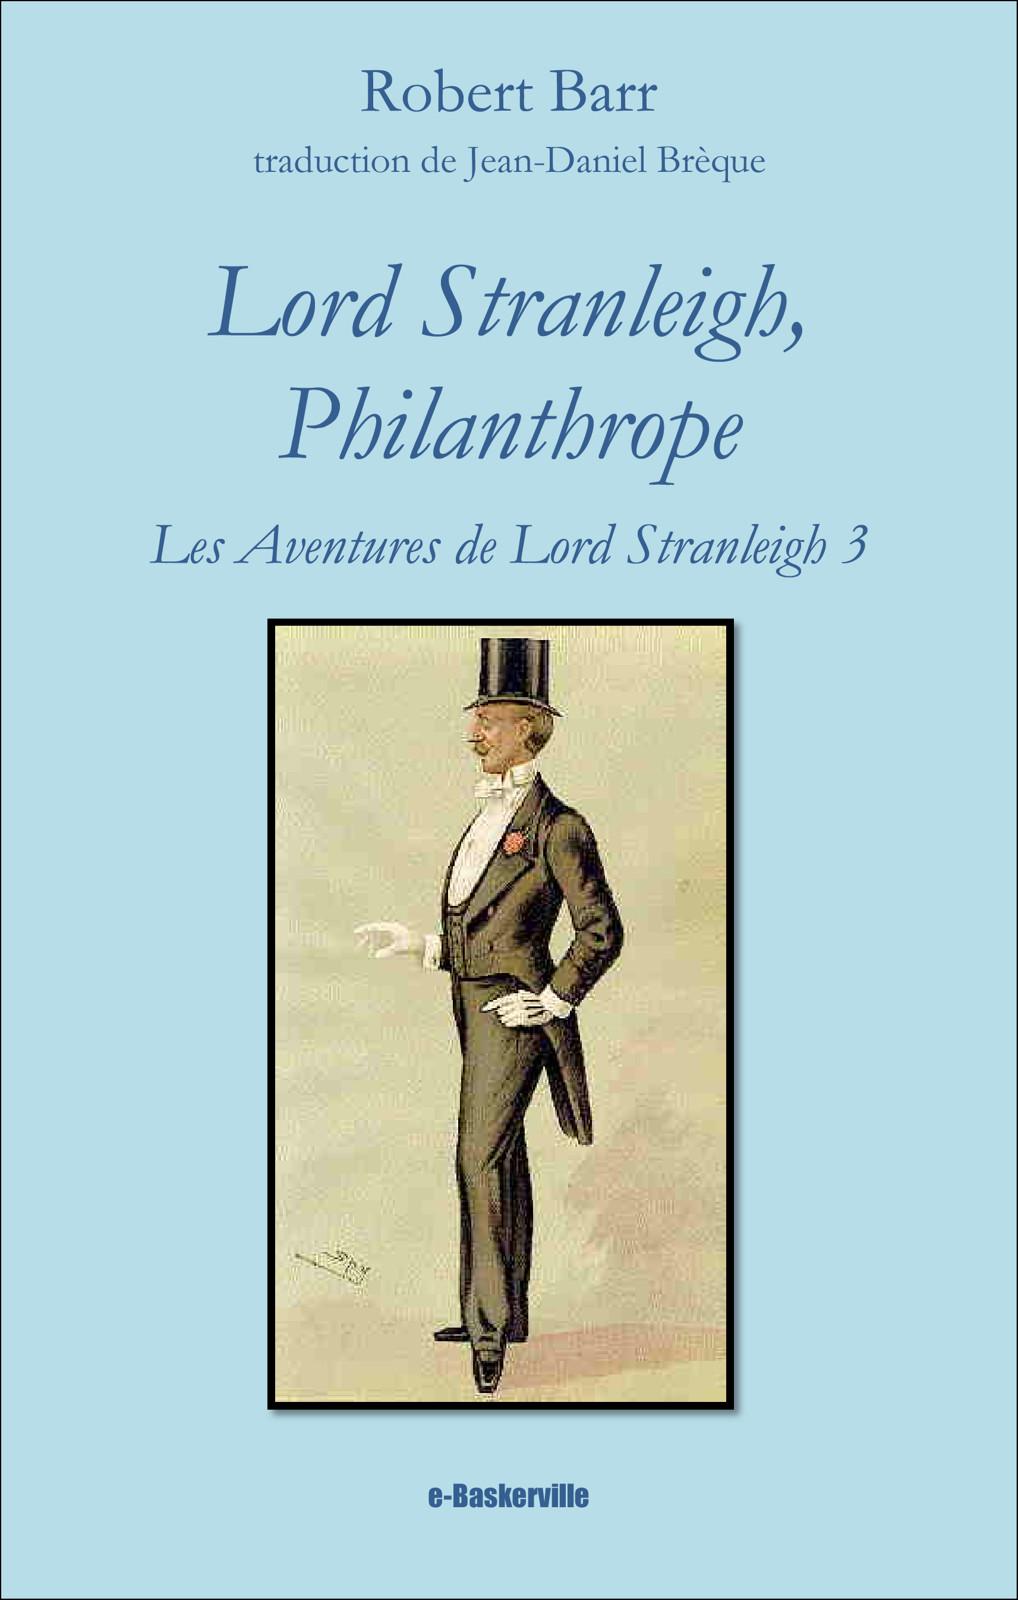 Lord Stranleigh, Philanthrope (les aventures de Lord Stranleigh, 3)